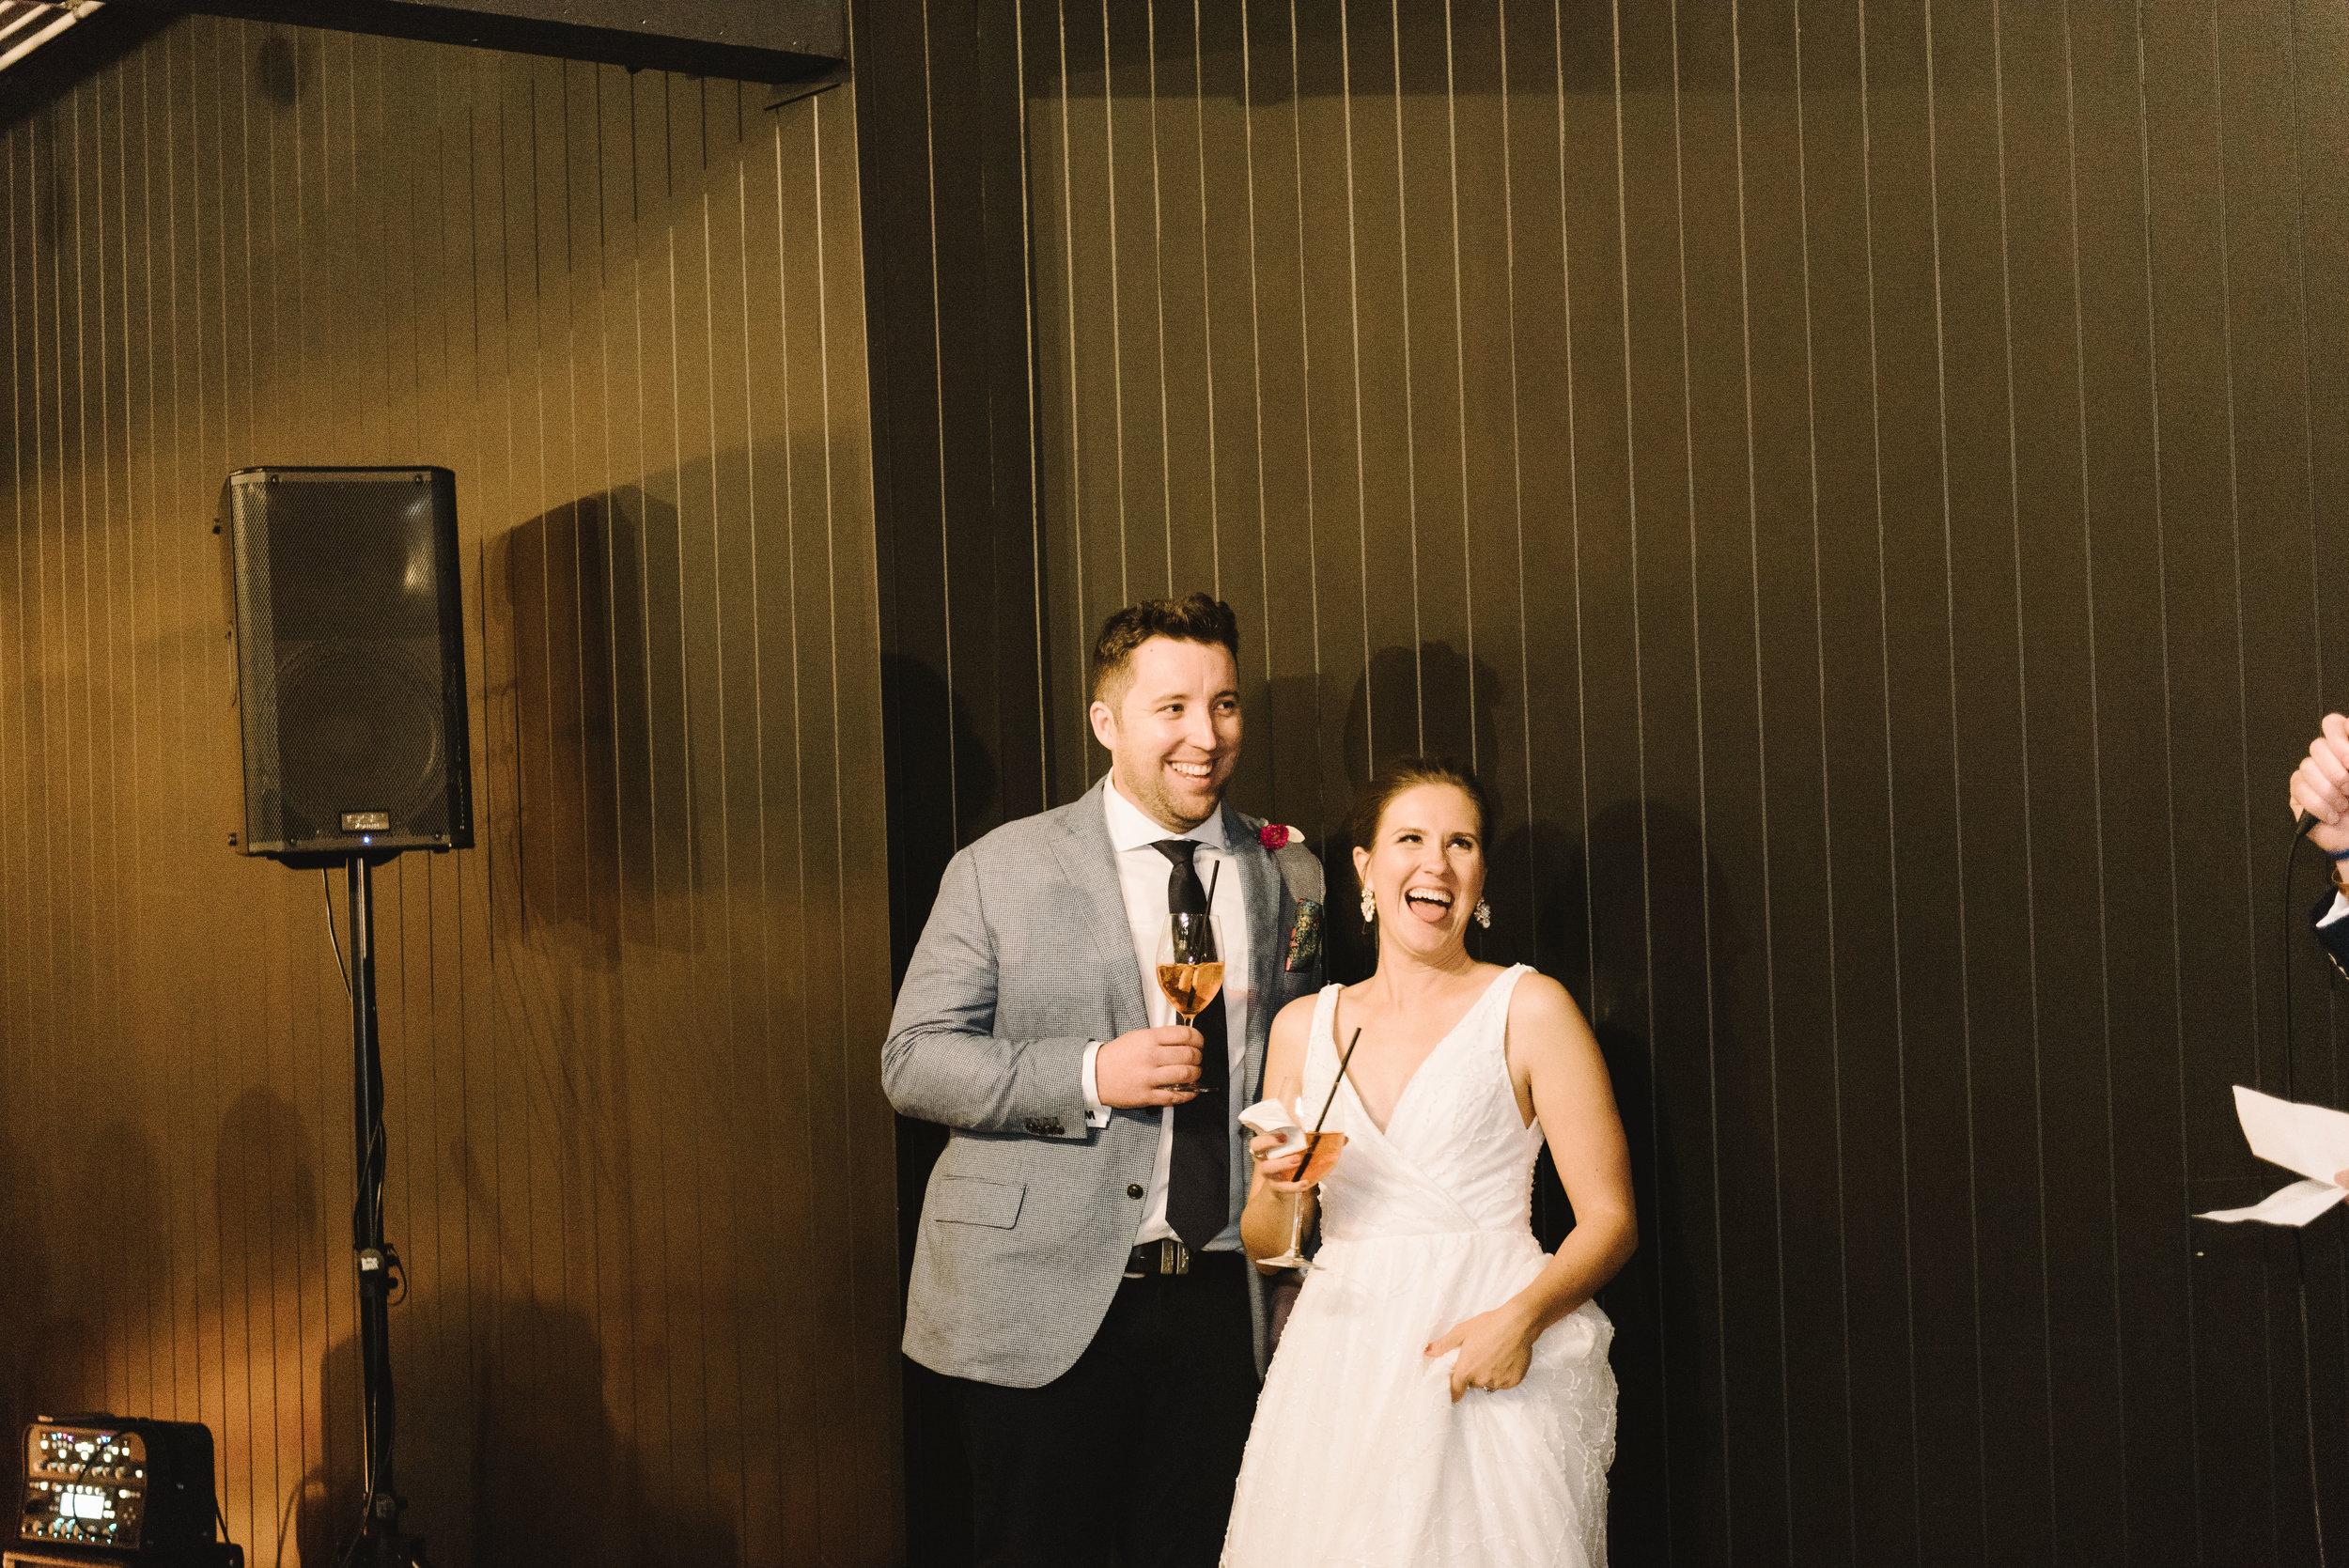 refinery-wedding-brisbane-city-wedding-photographer-100.jpg